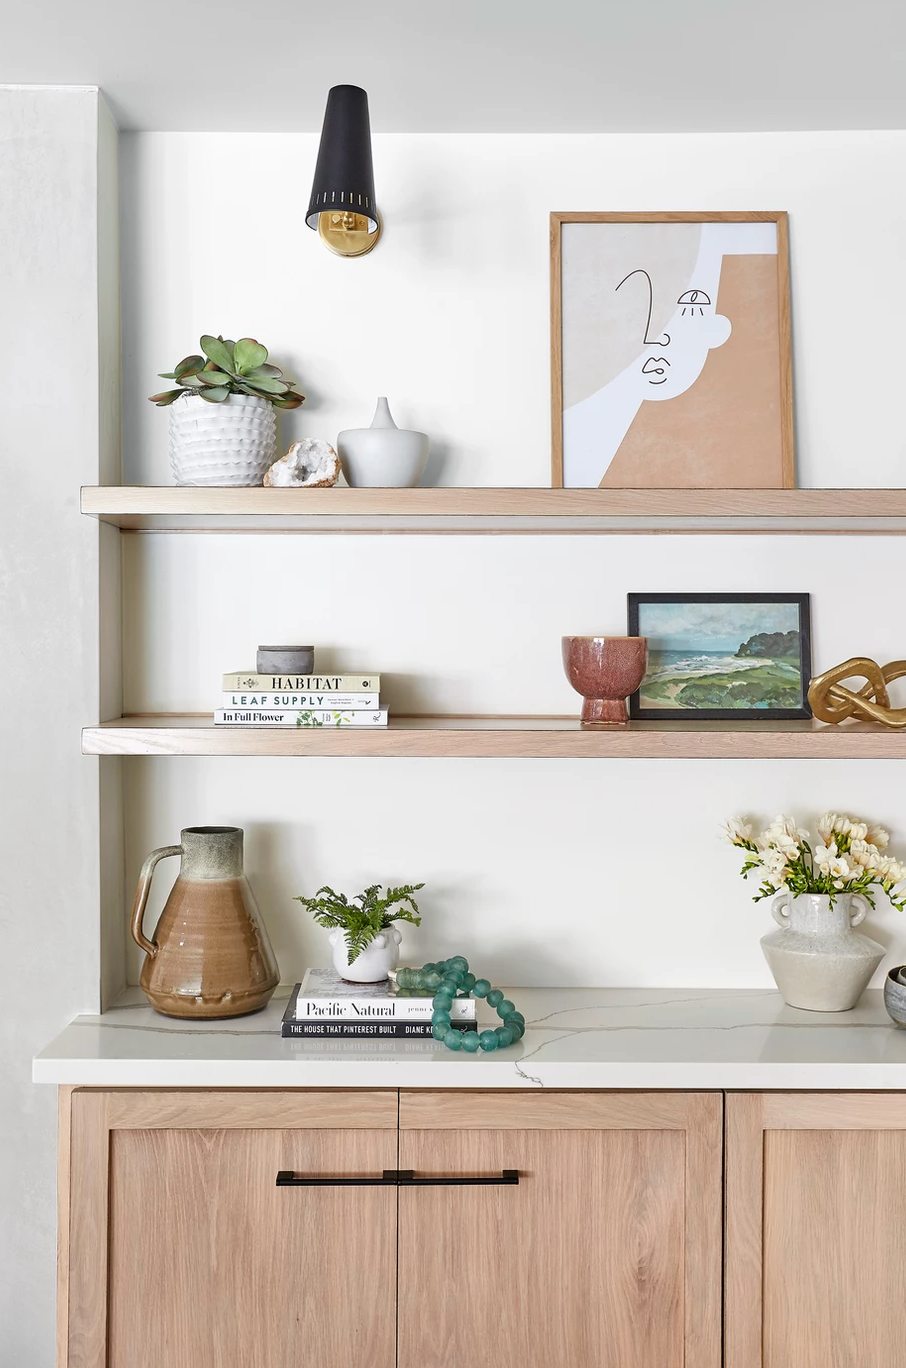 6 Creative Ways to Display Art by Lindsey Brooke Design